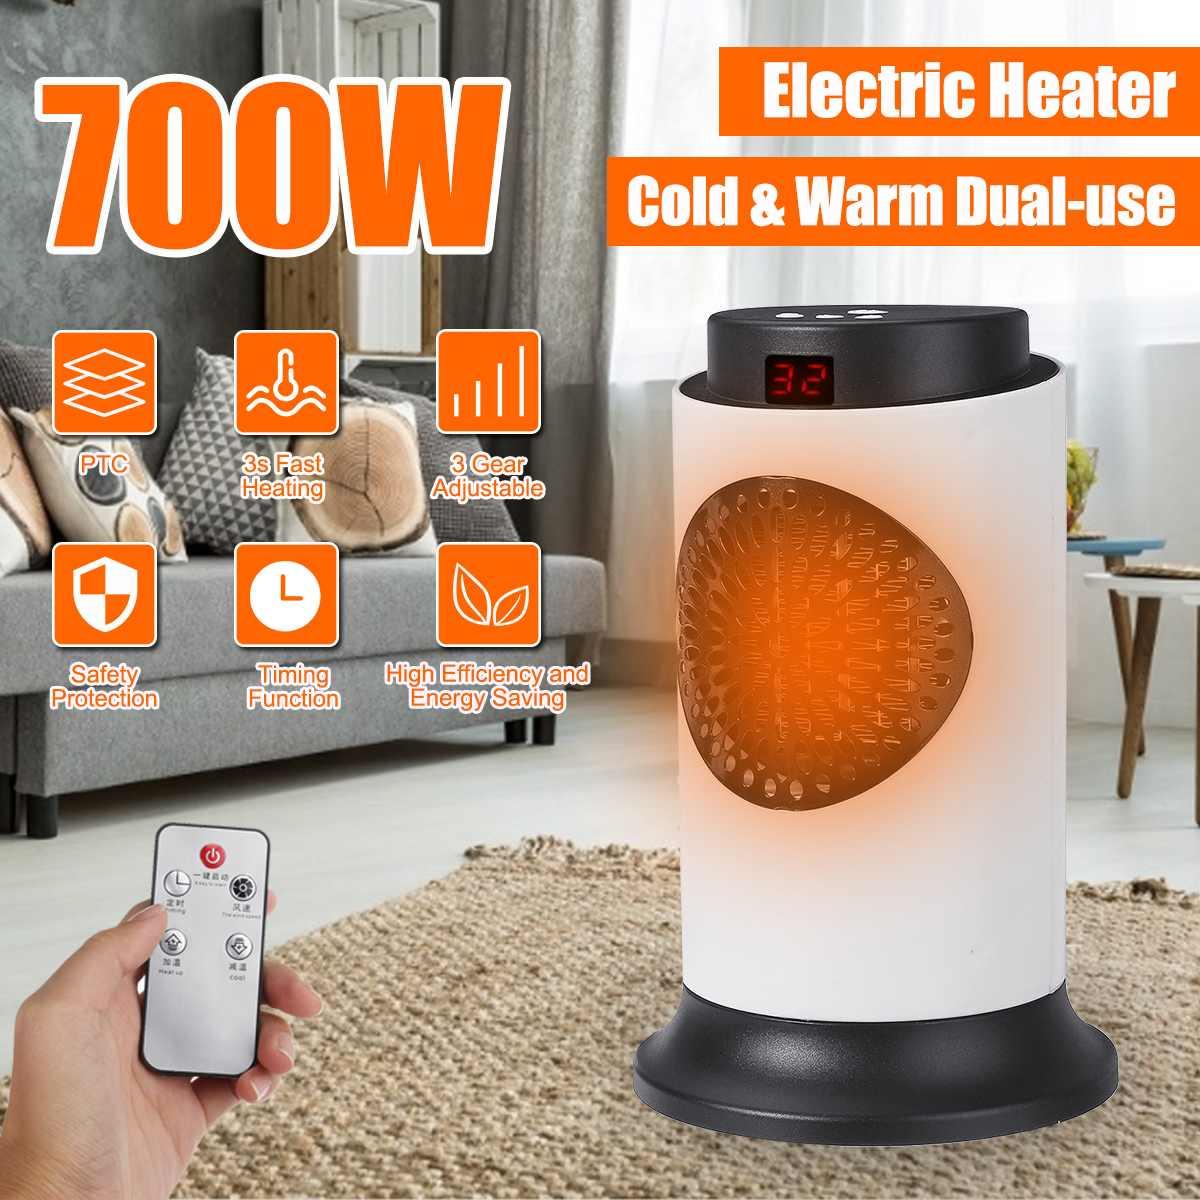 220V 50Hz 700W Power Electric Heater Ceramic Heating Electric Warmer Heater Room Heaters Warm Air Fan Heater